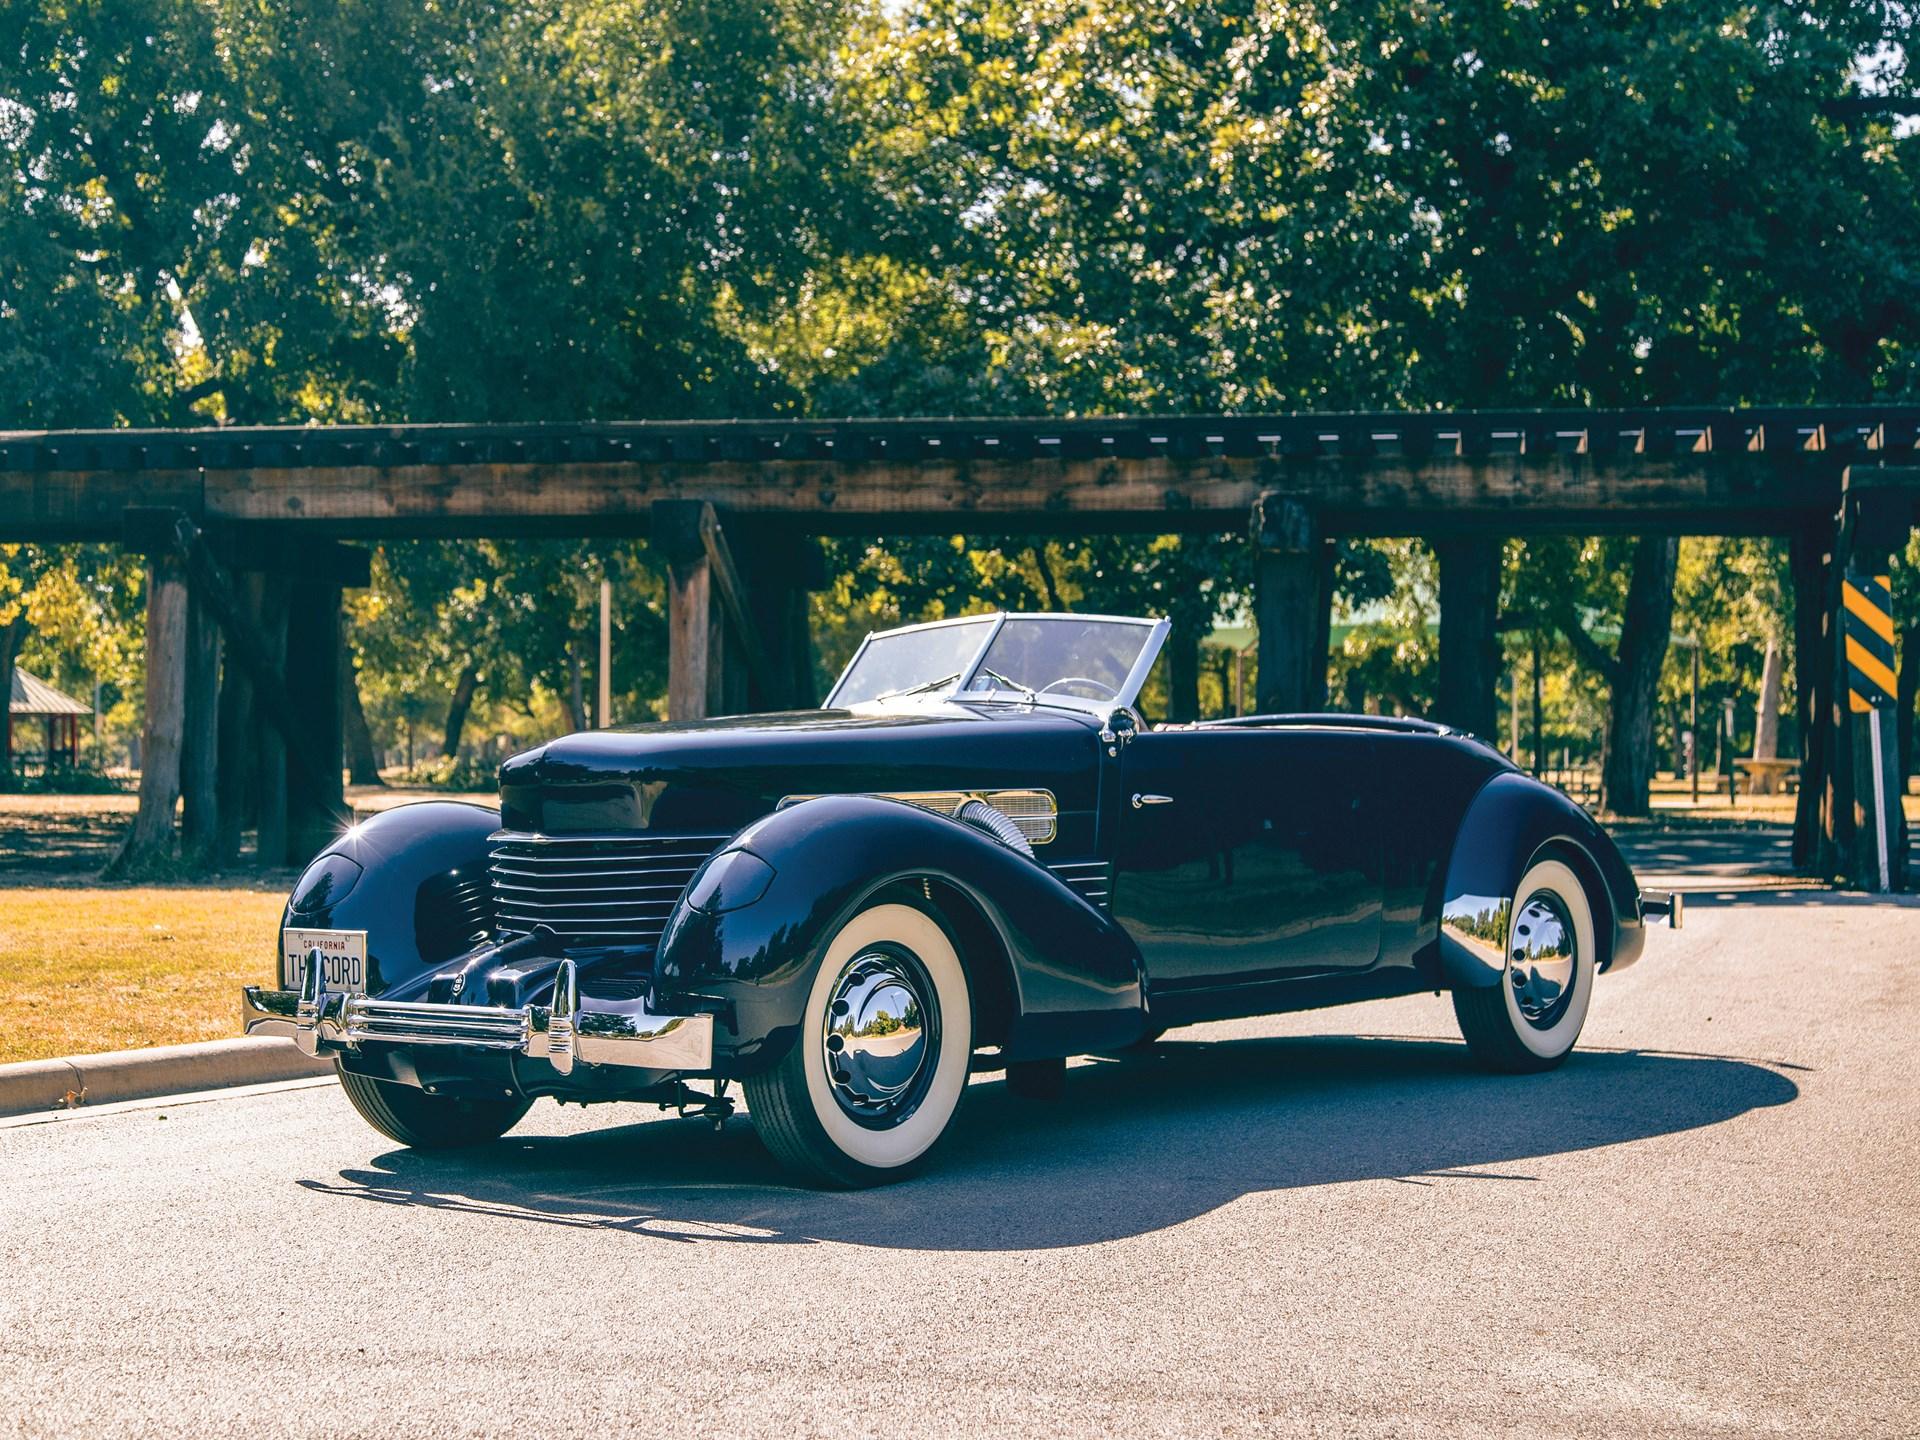 1937 Cord 812 Supercharged Phaeton